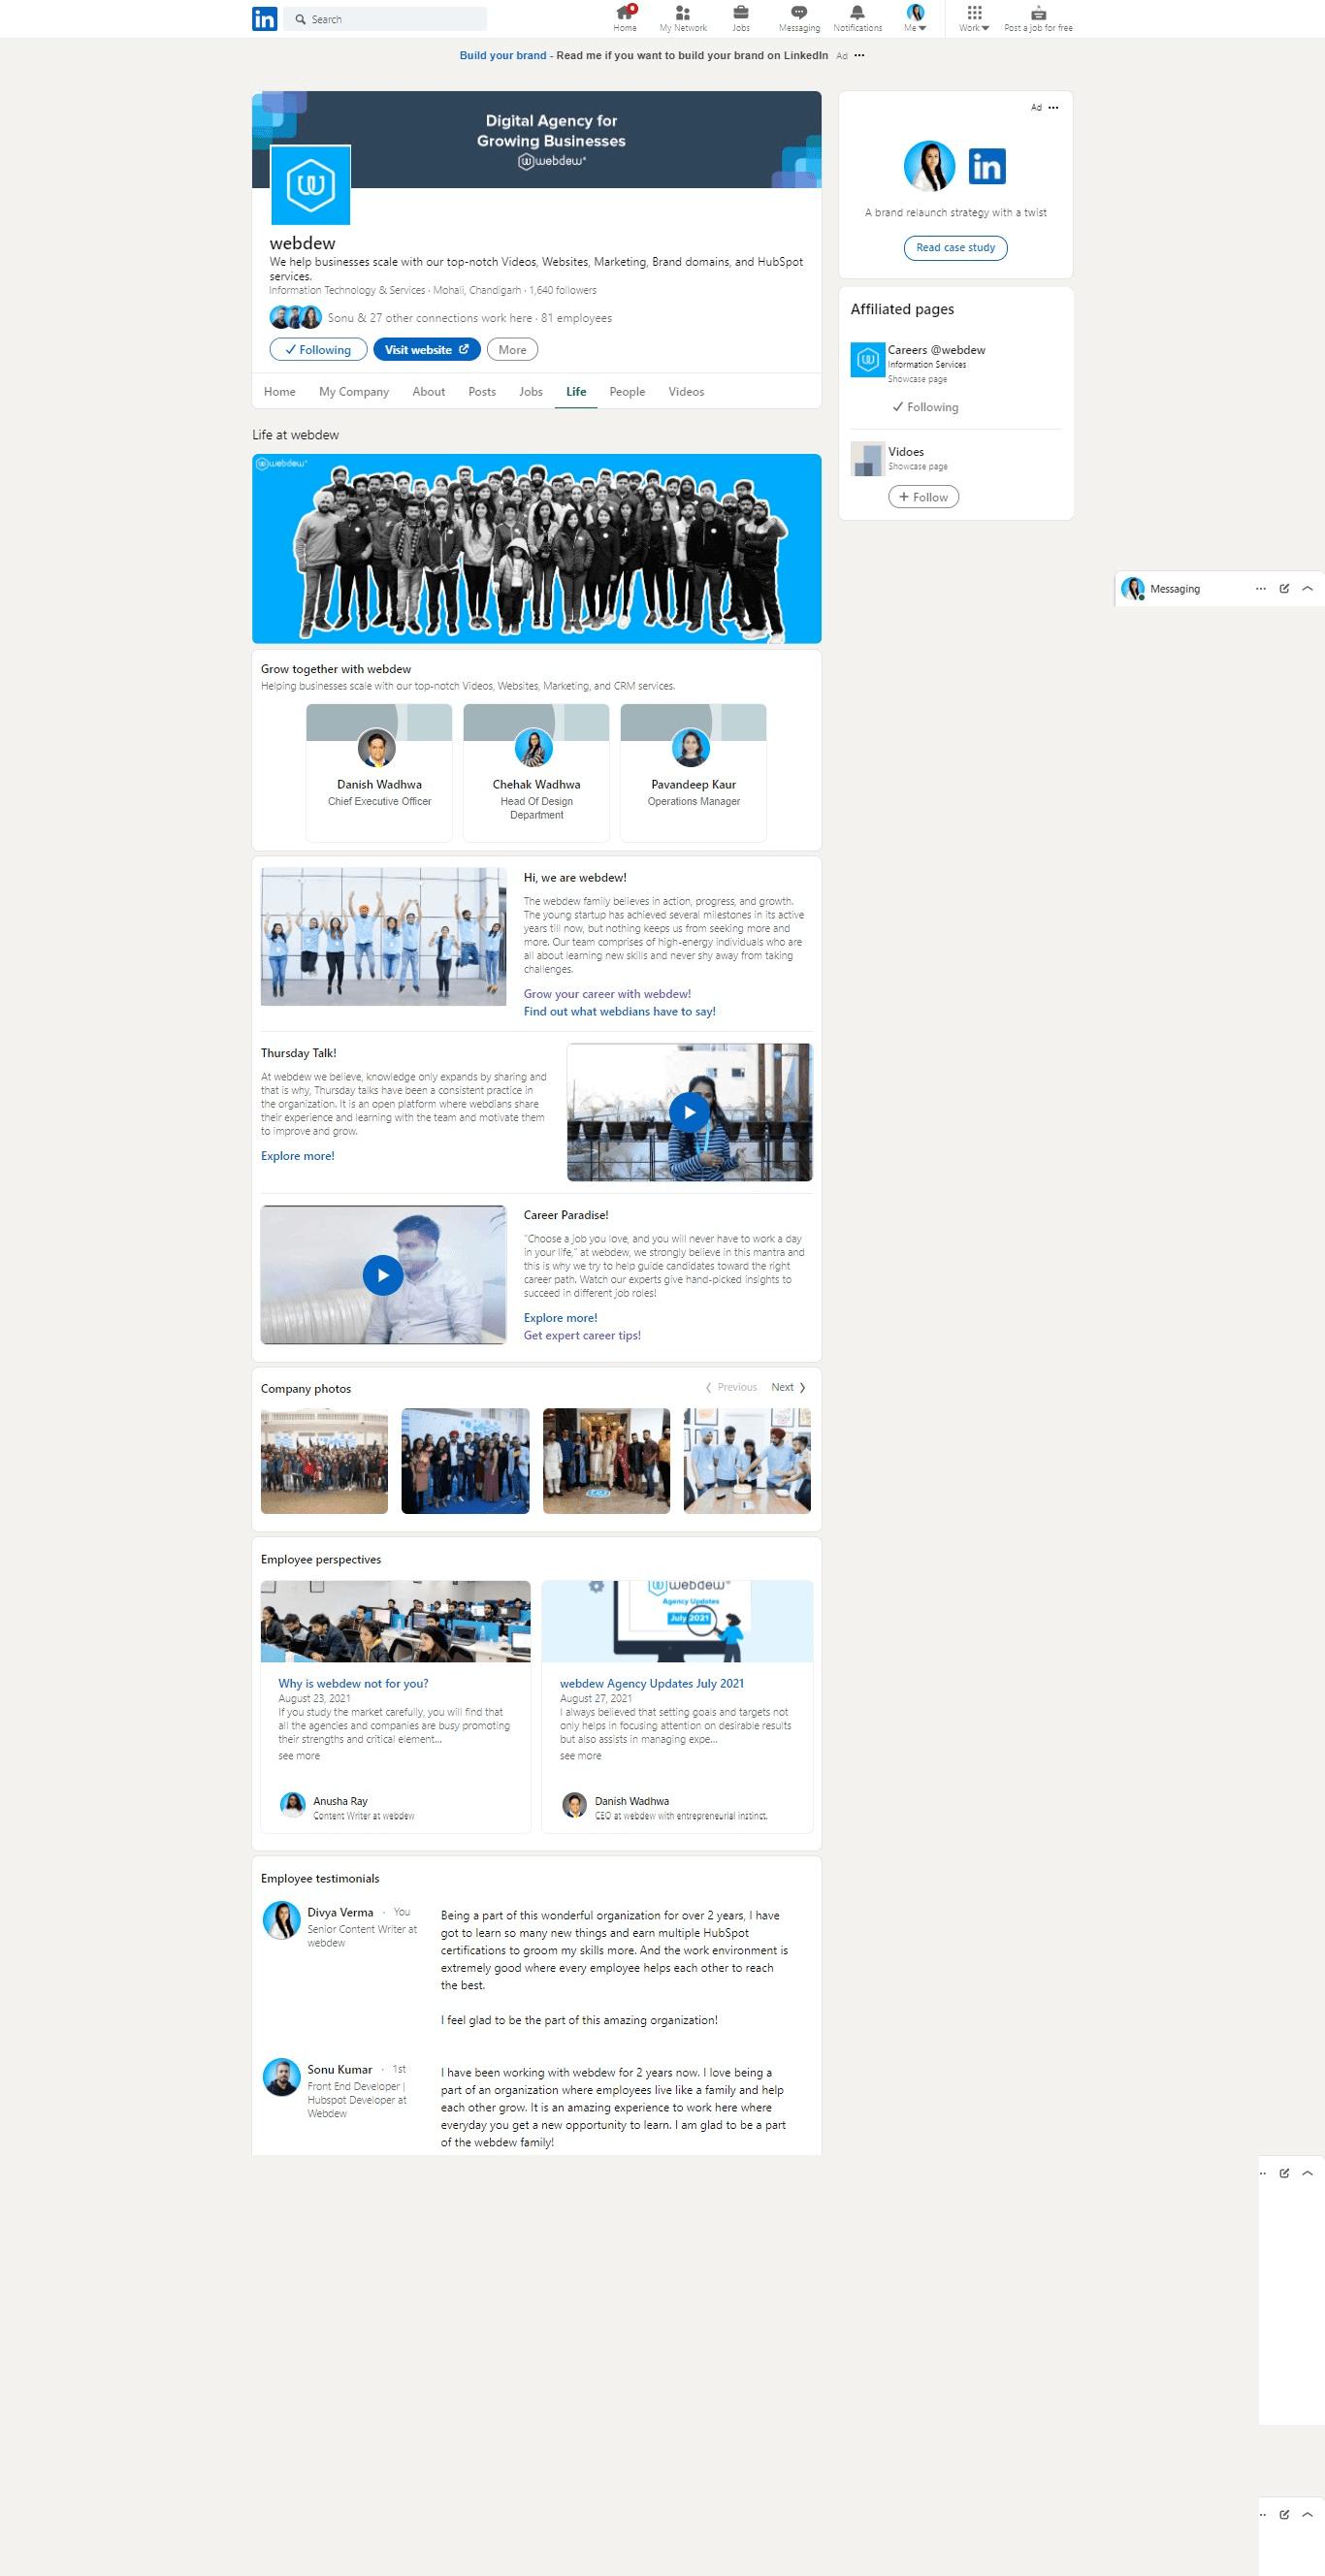 webdew-life-page-linkedIn